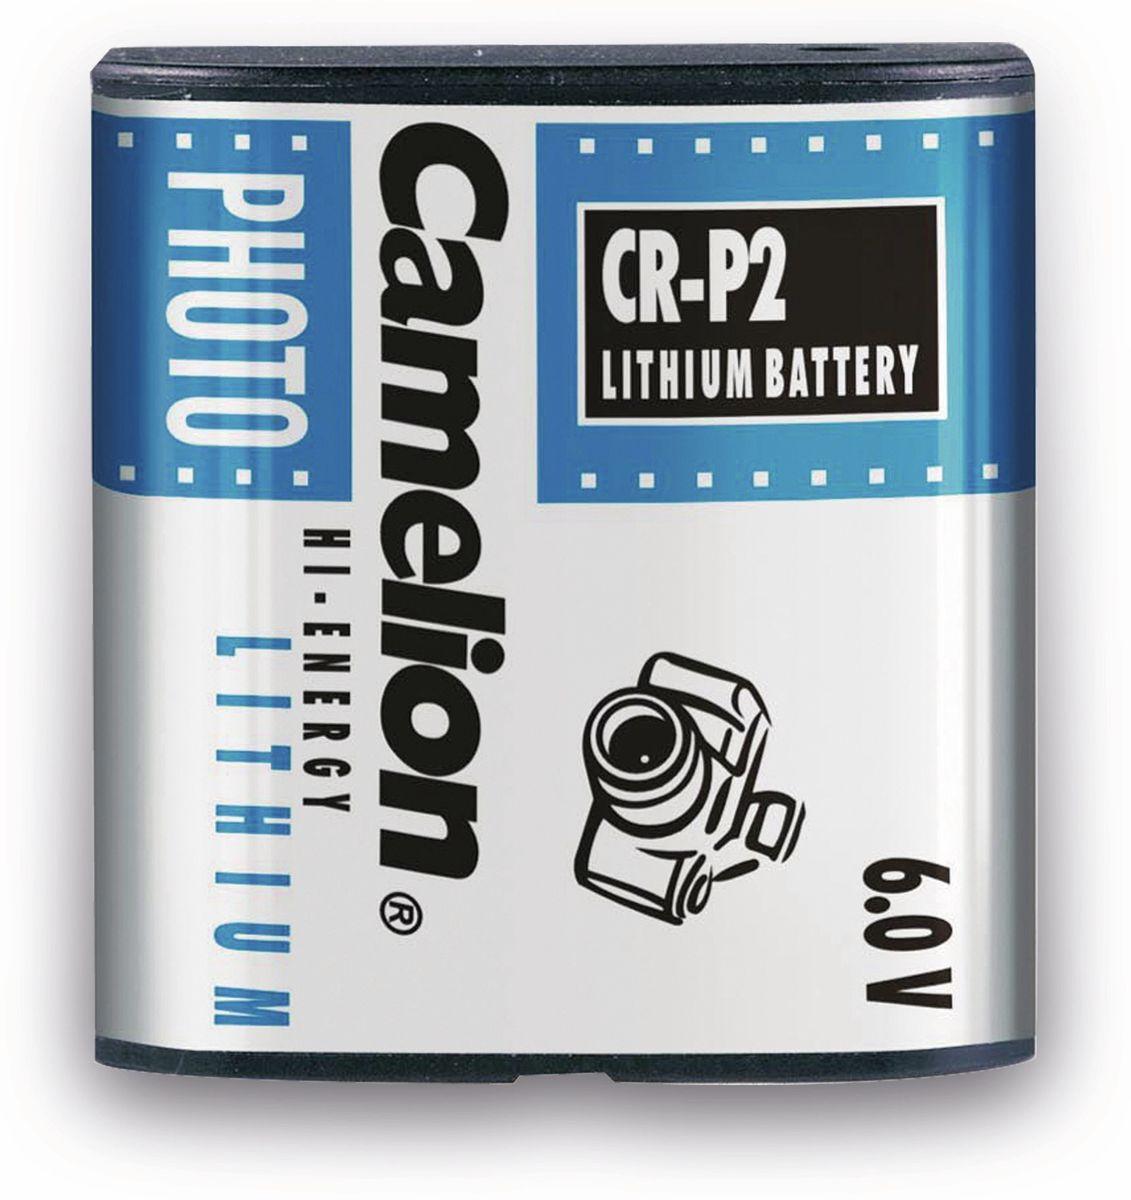 lithium batterie camelion cr p2 1 st ck online kaufen. Black Bedroom Furniture Sets. Home Design Ideas